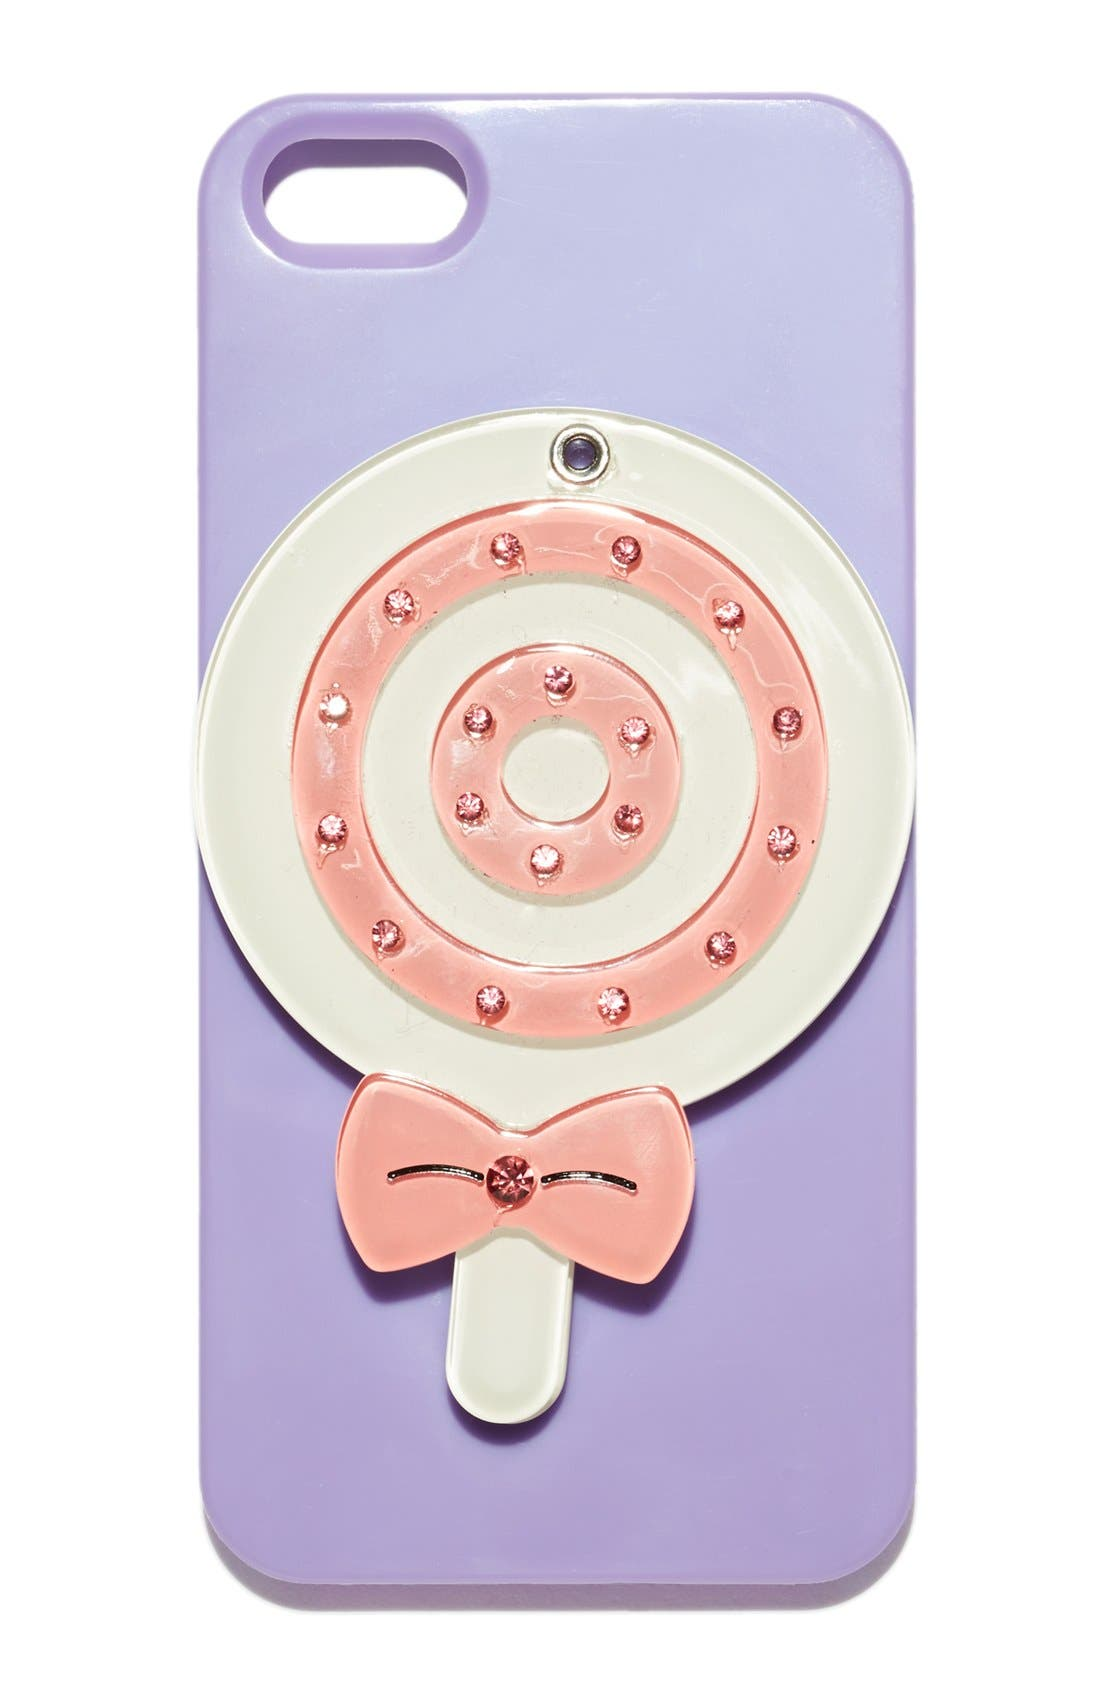 Alternate Image 1 Selected - Nordstrom 'Lollipop - Mirror' iPhone 5 & 5S Case